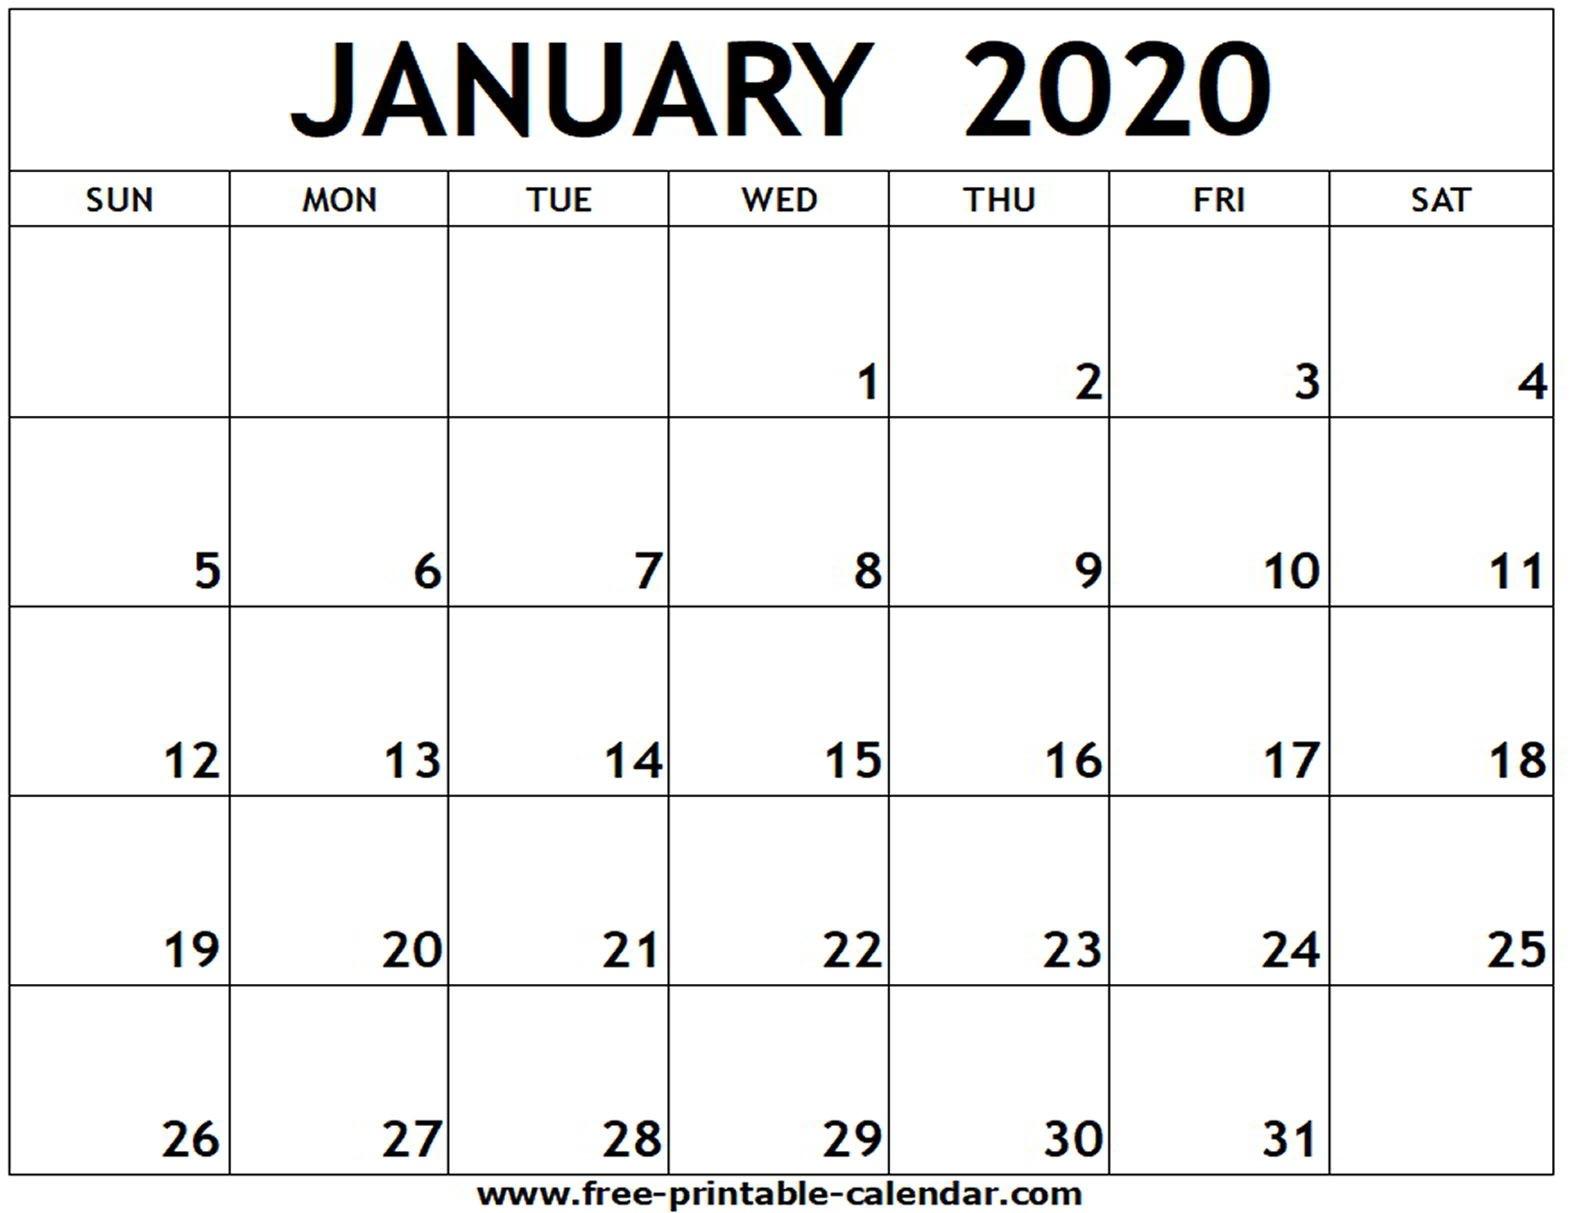 January 2020 Printable Calendar - Free-Printable-Calendar-January 2020 Calendar Page